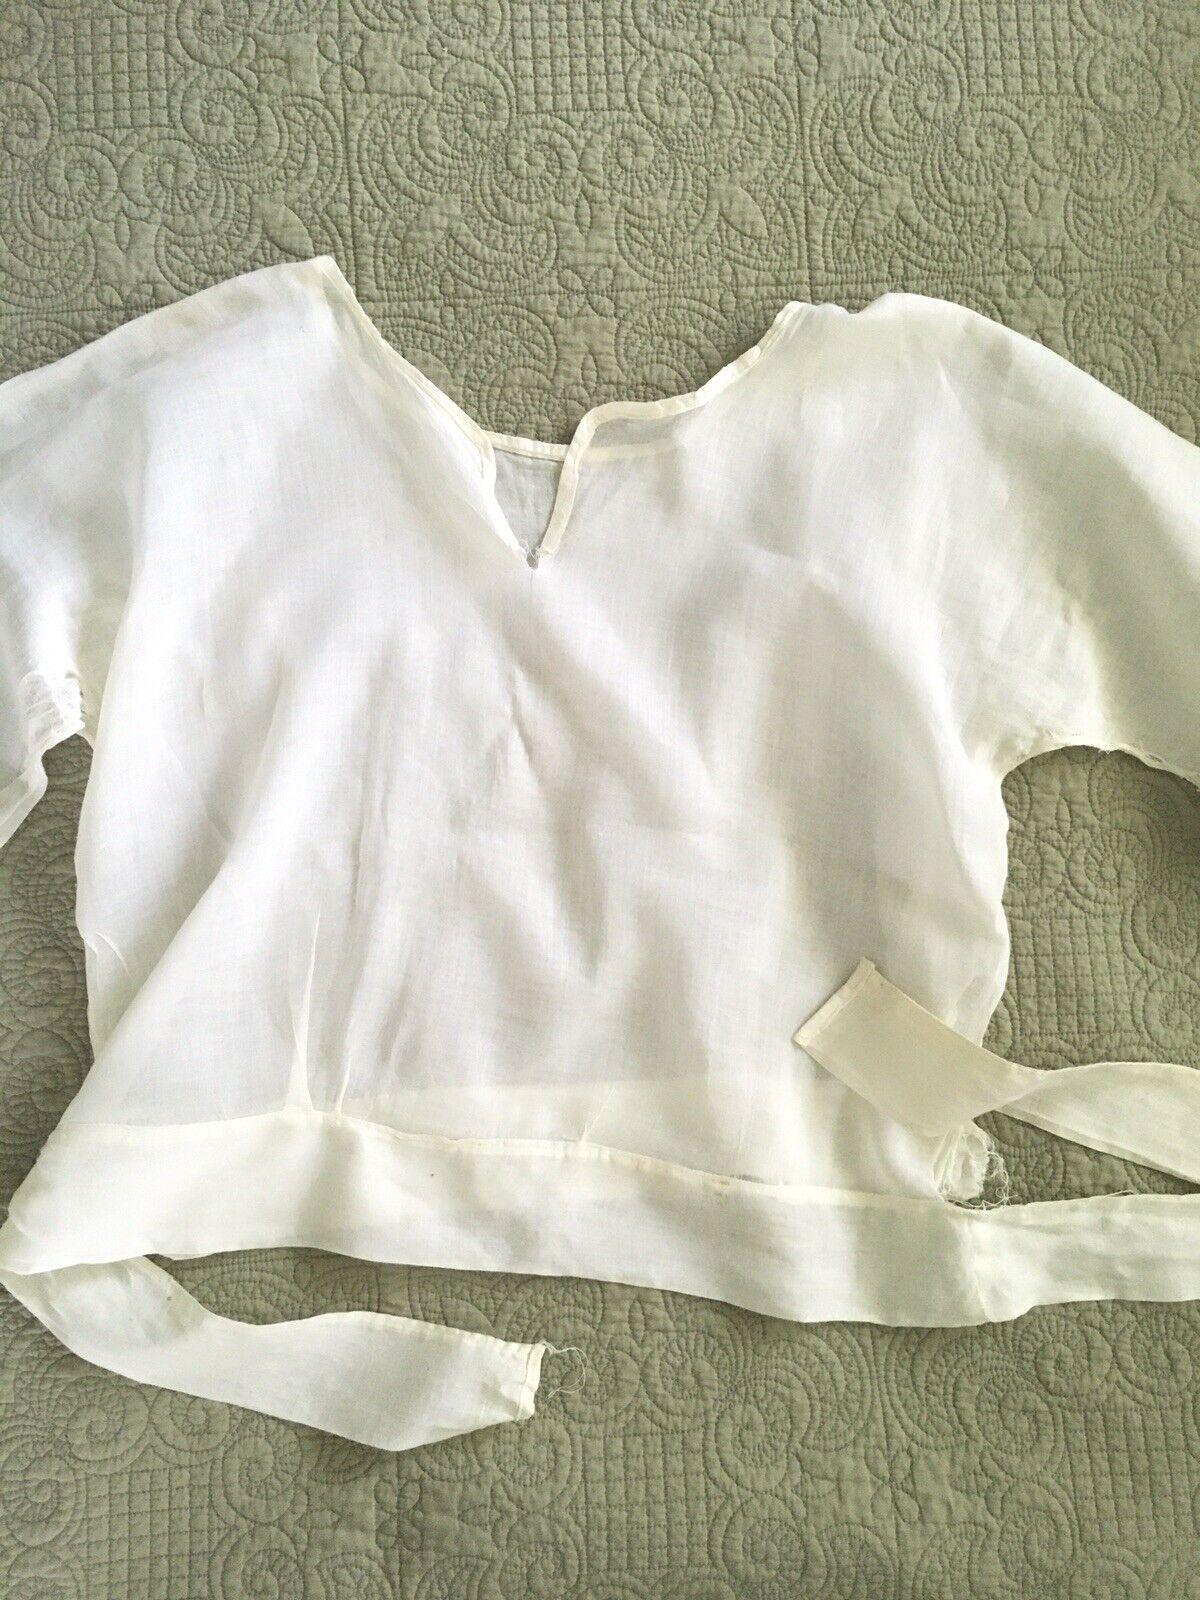 Antique Edwardian Victorian Shirtwaist Blouse - image 3